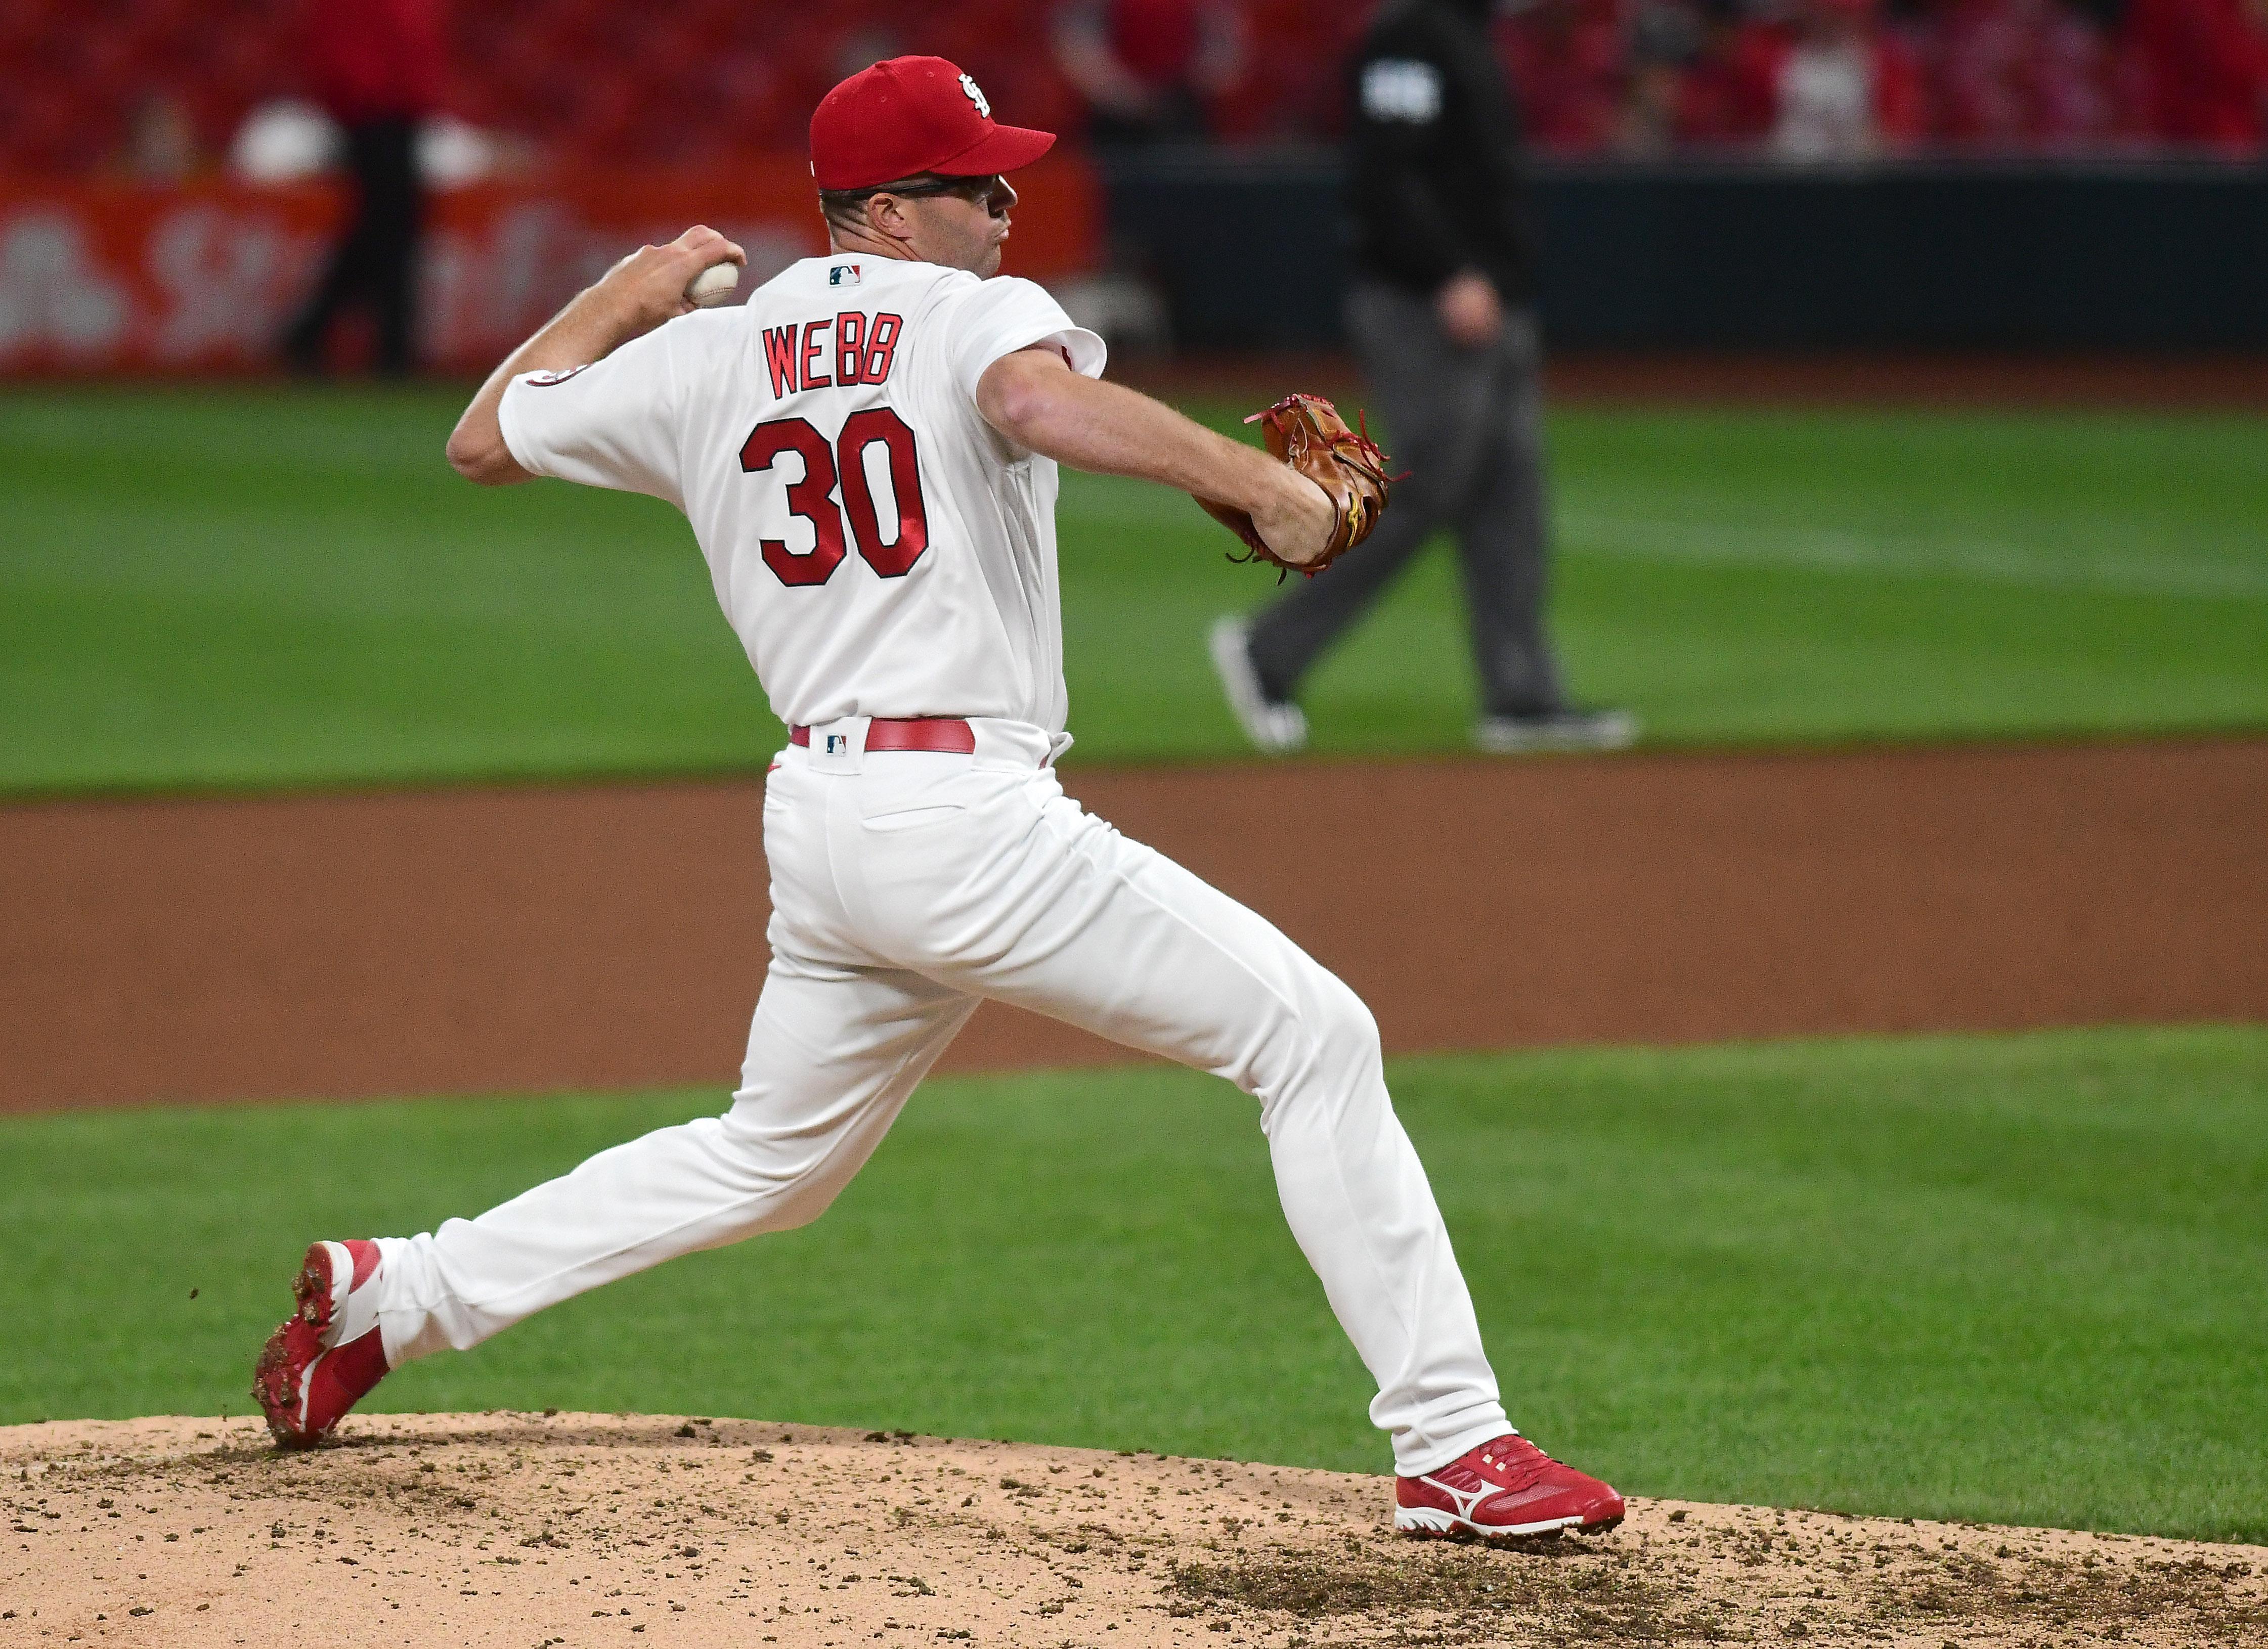 MLB: APR 28 Phillies at Cardinals